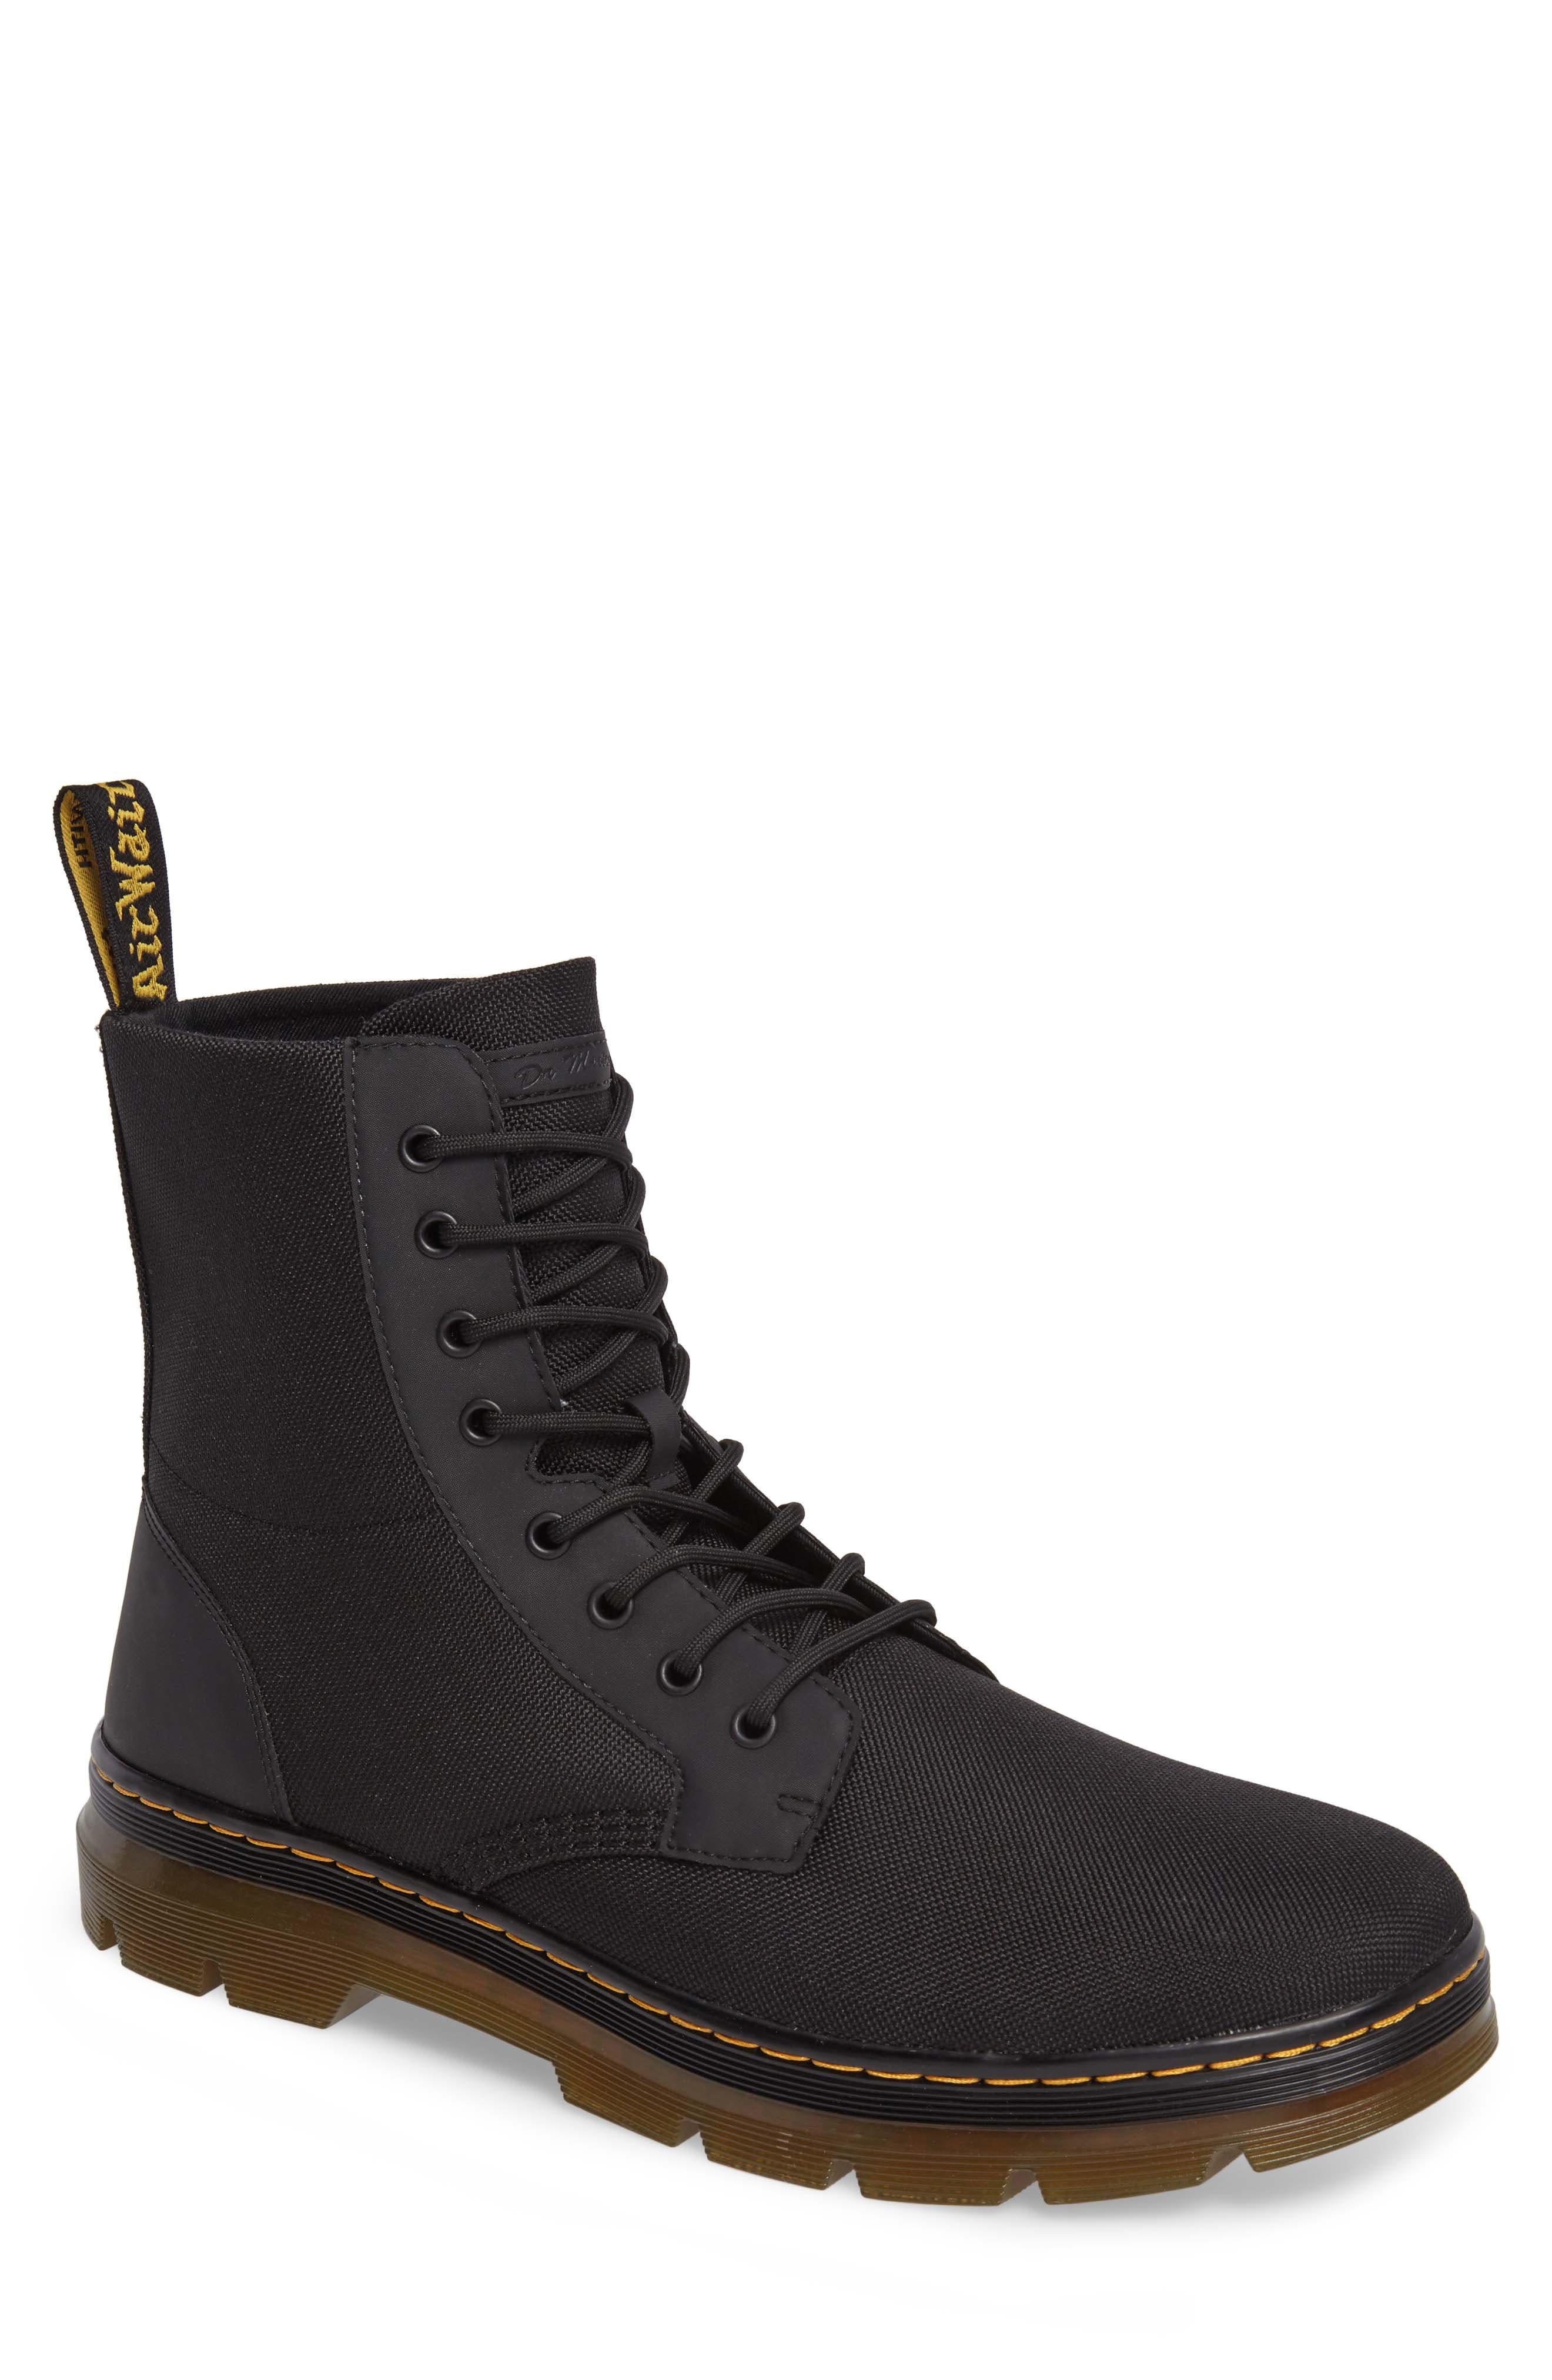 'Combs' Plain Toe Boot,                         Main,                         color, 001